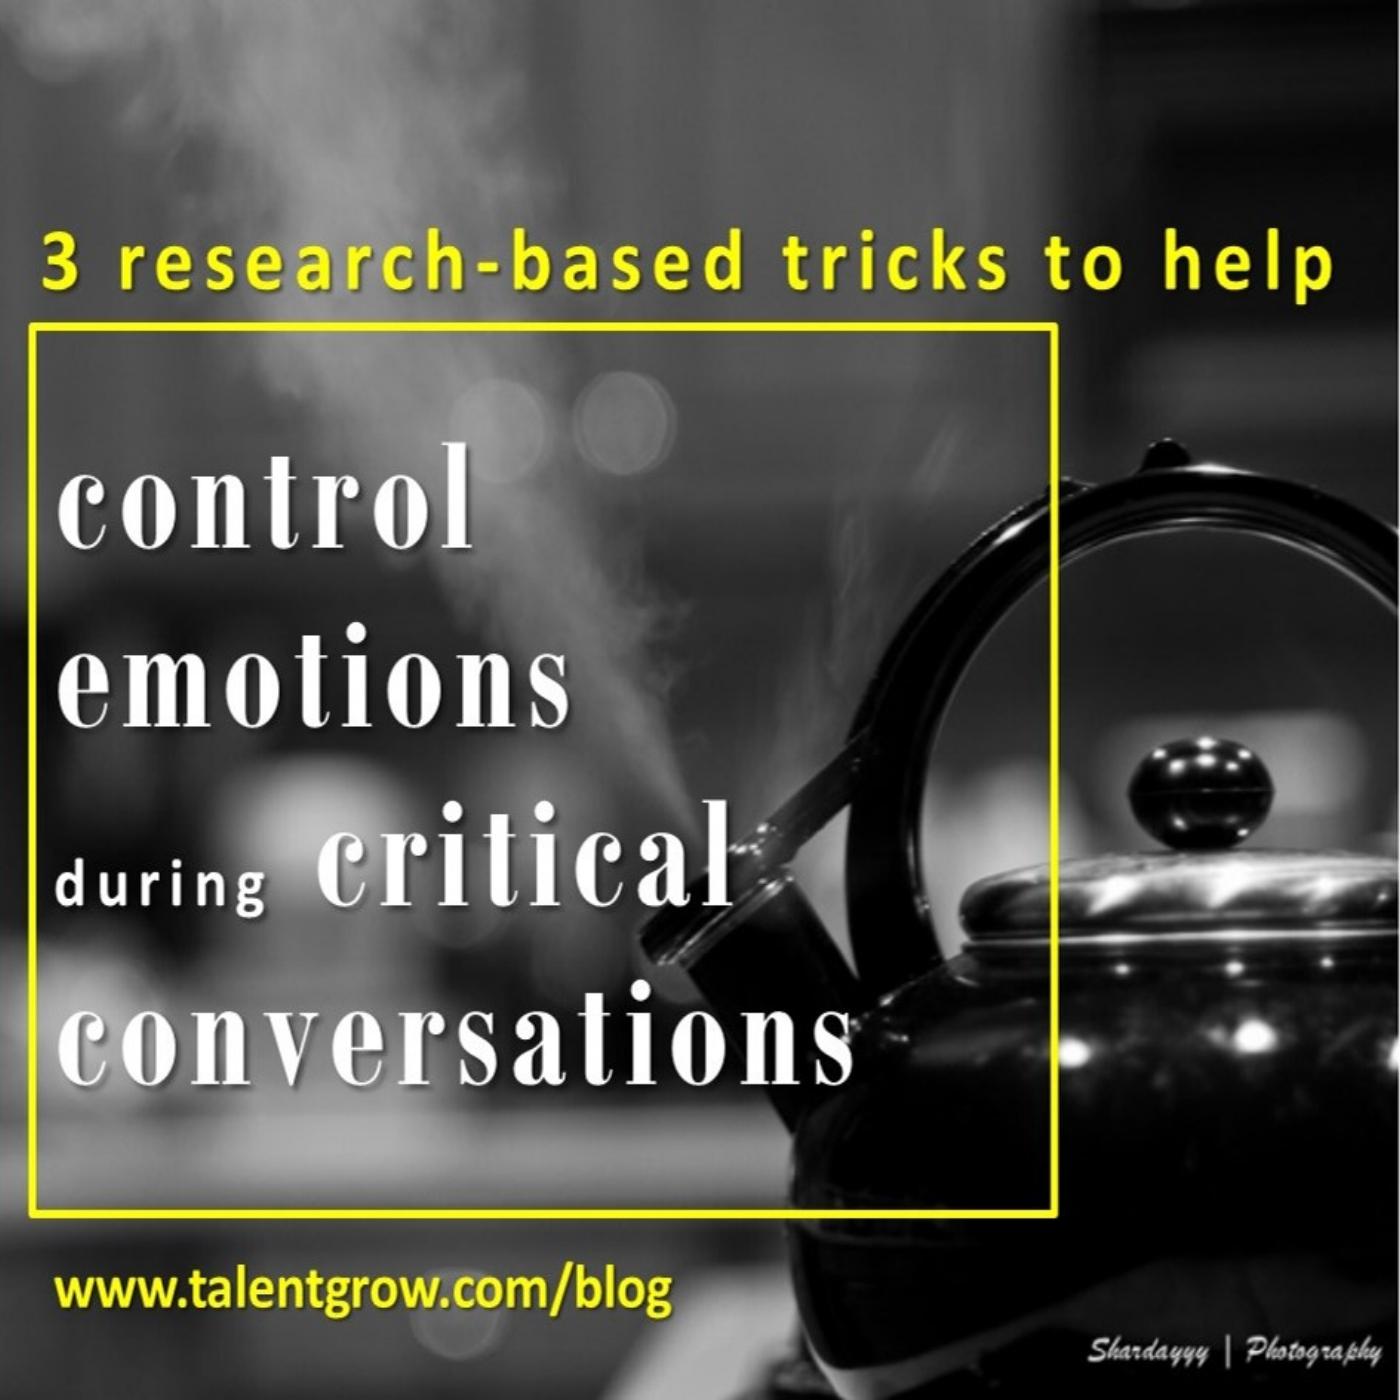 control emotions during critical conversations thumbnail.jpg